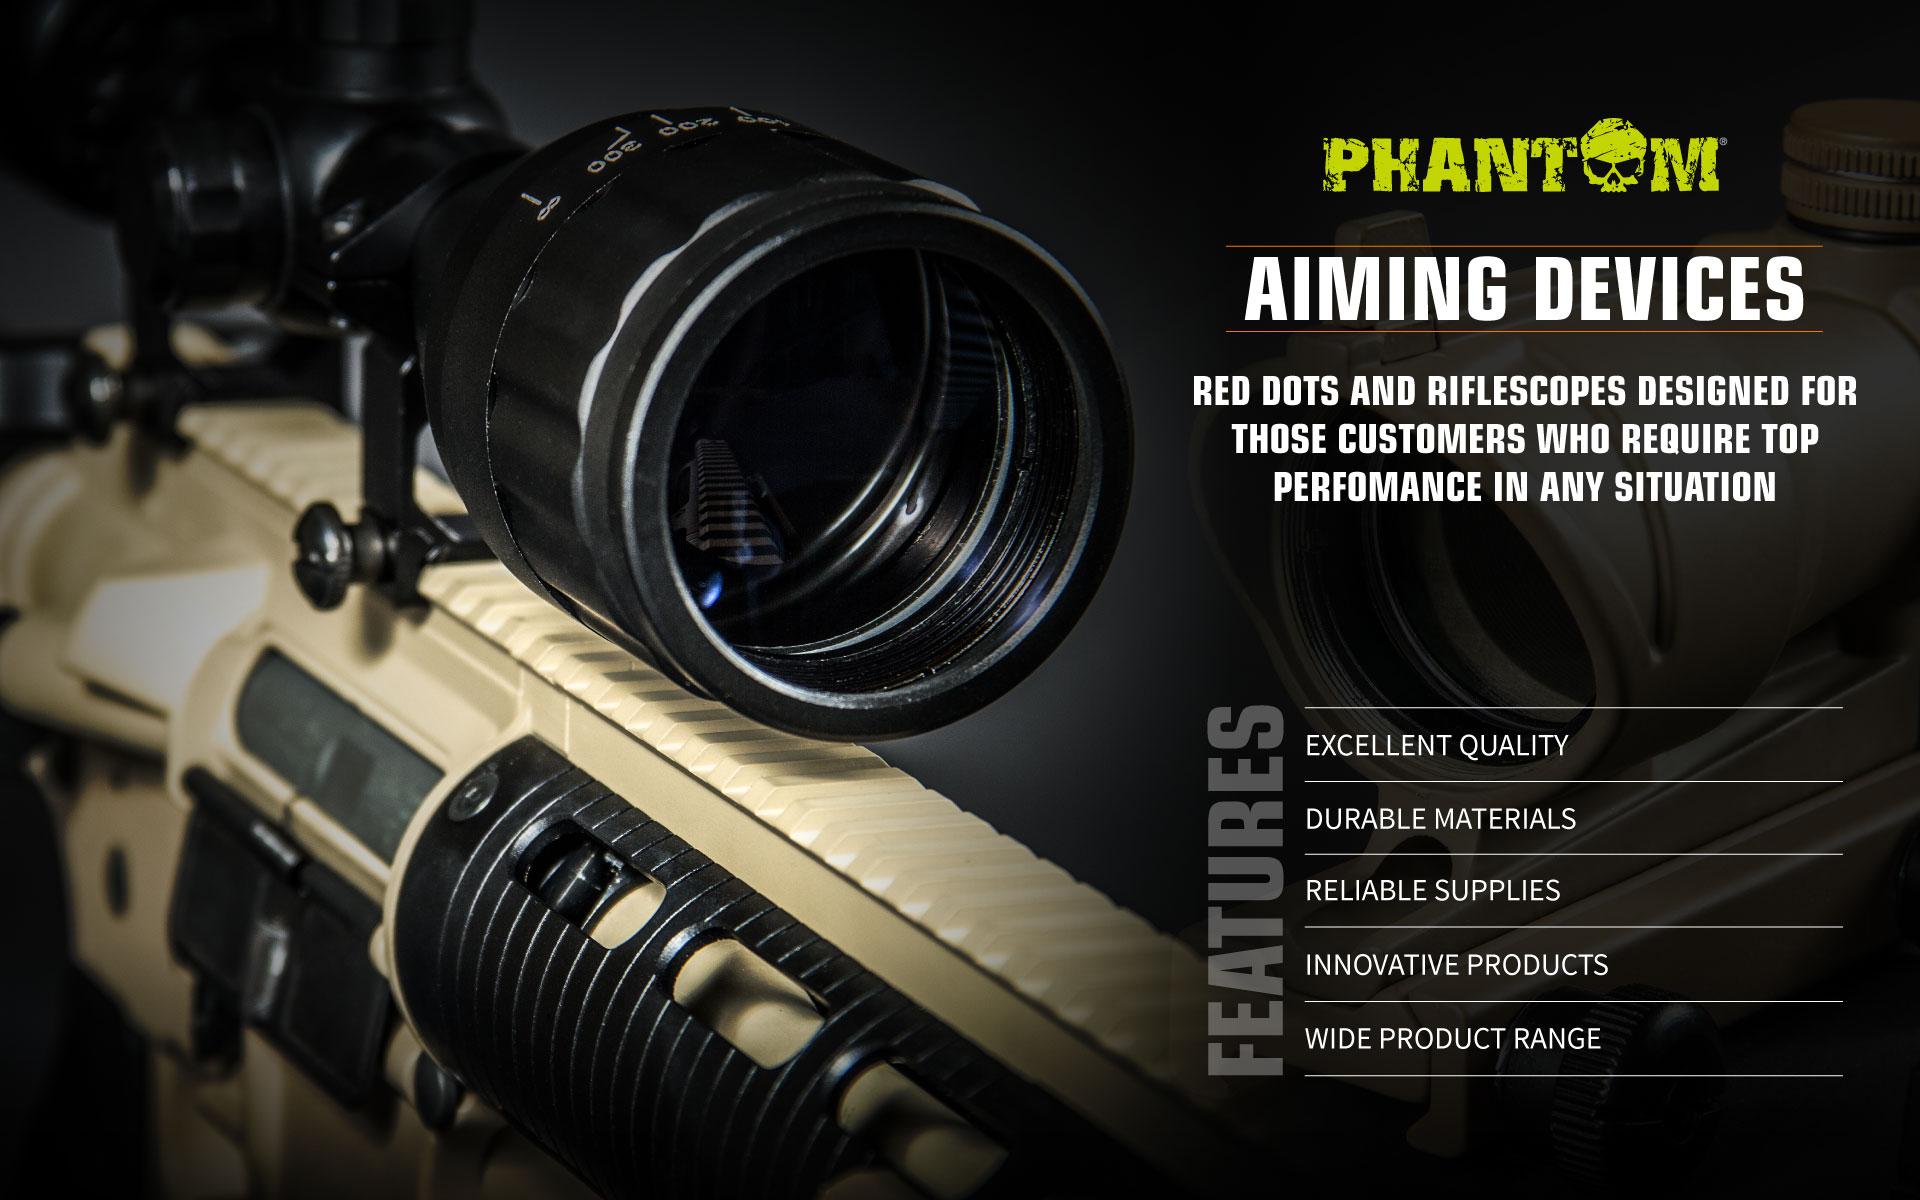 Phantom Aiming Devices